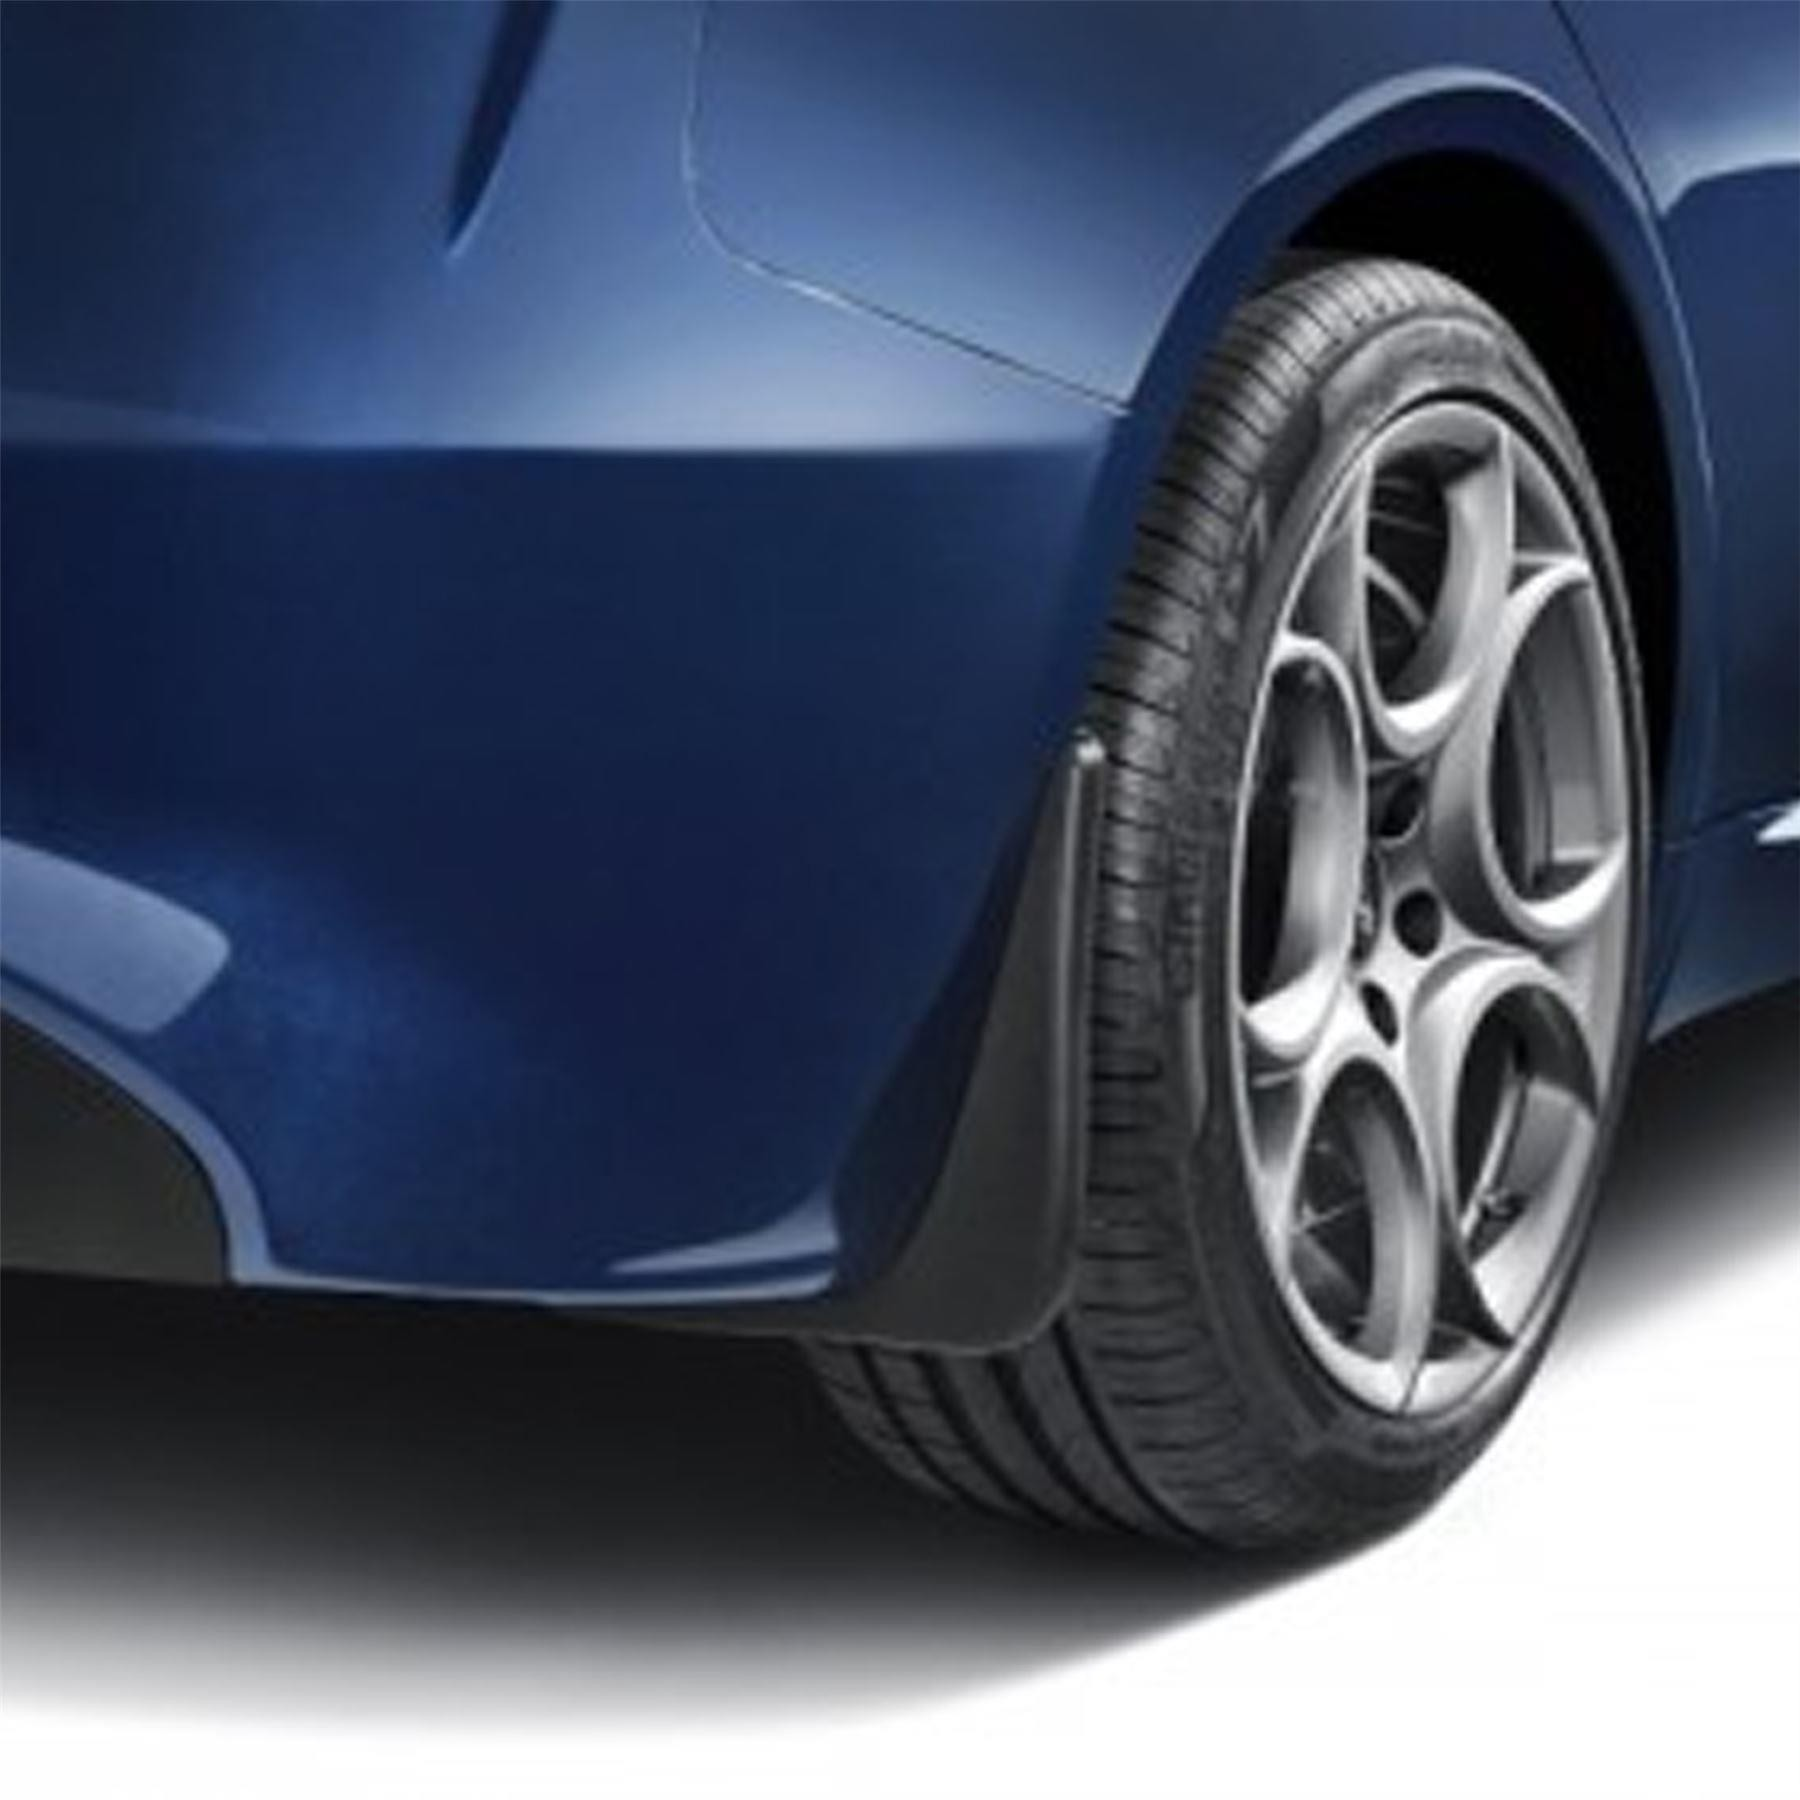 Giulia Rear Splash Guards/Mud Flaps - Spray Protection